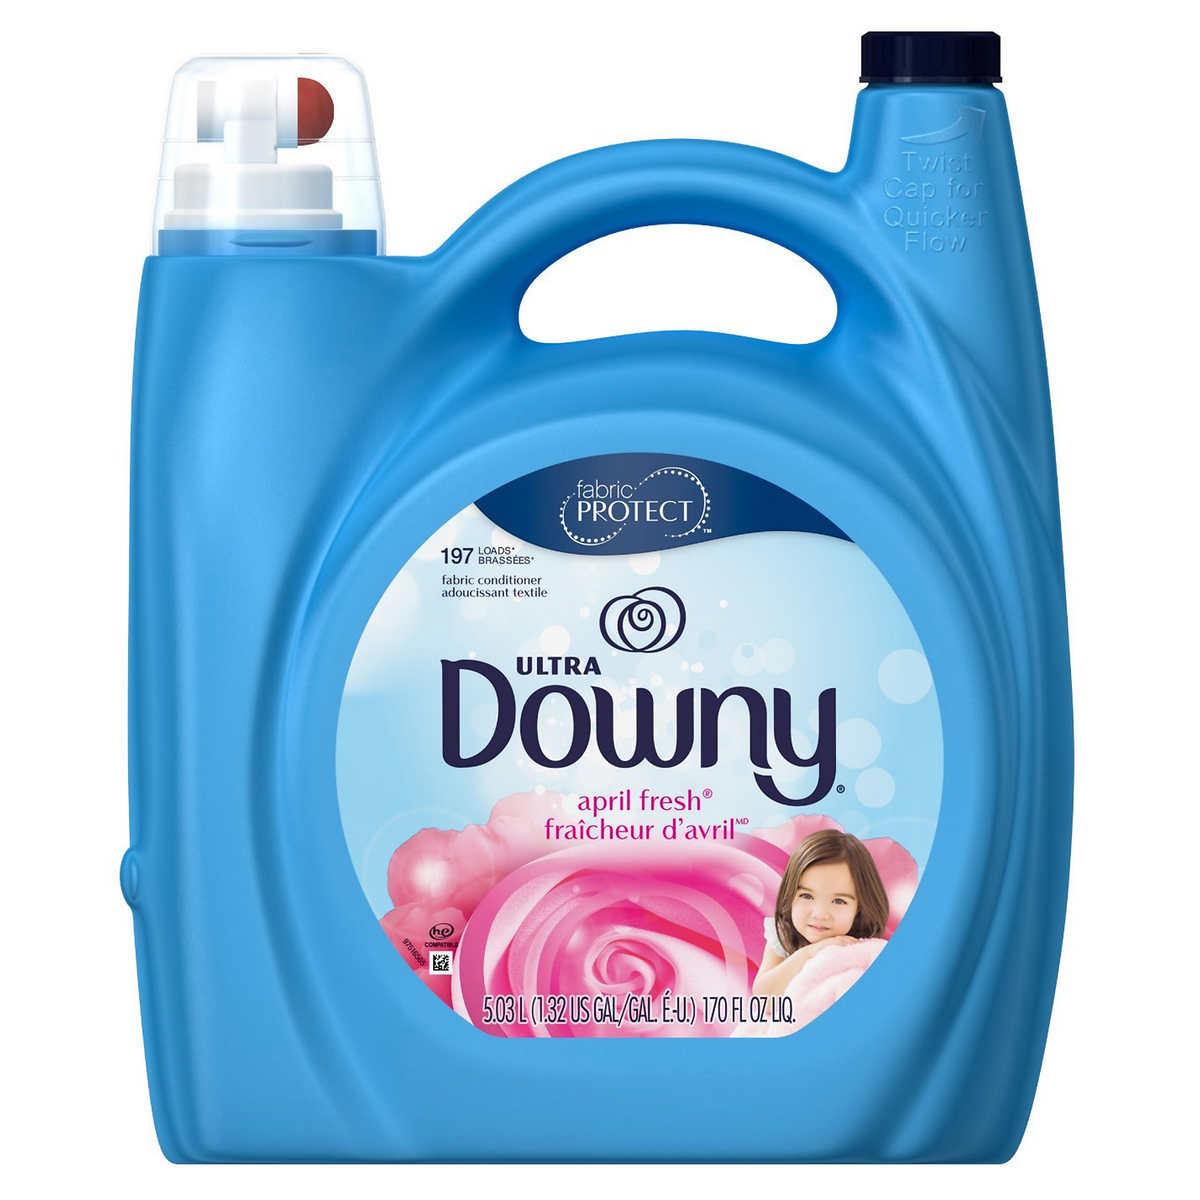 nuoc-xa-vai-downy-fabric-protect-dam-dac-503-lit-cua-my